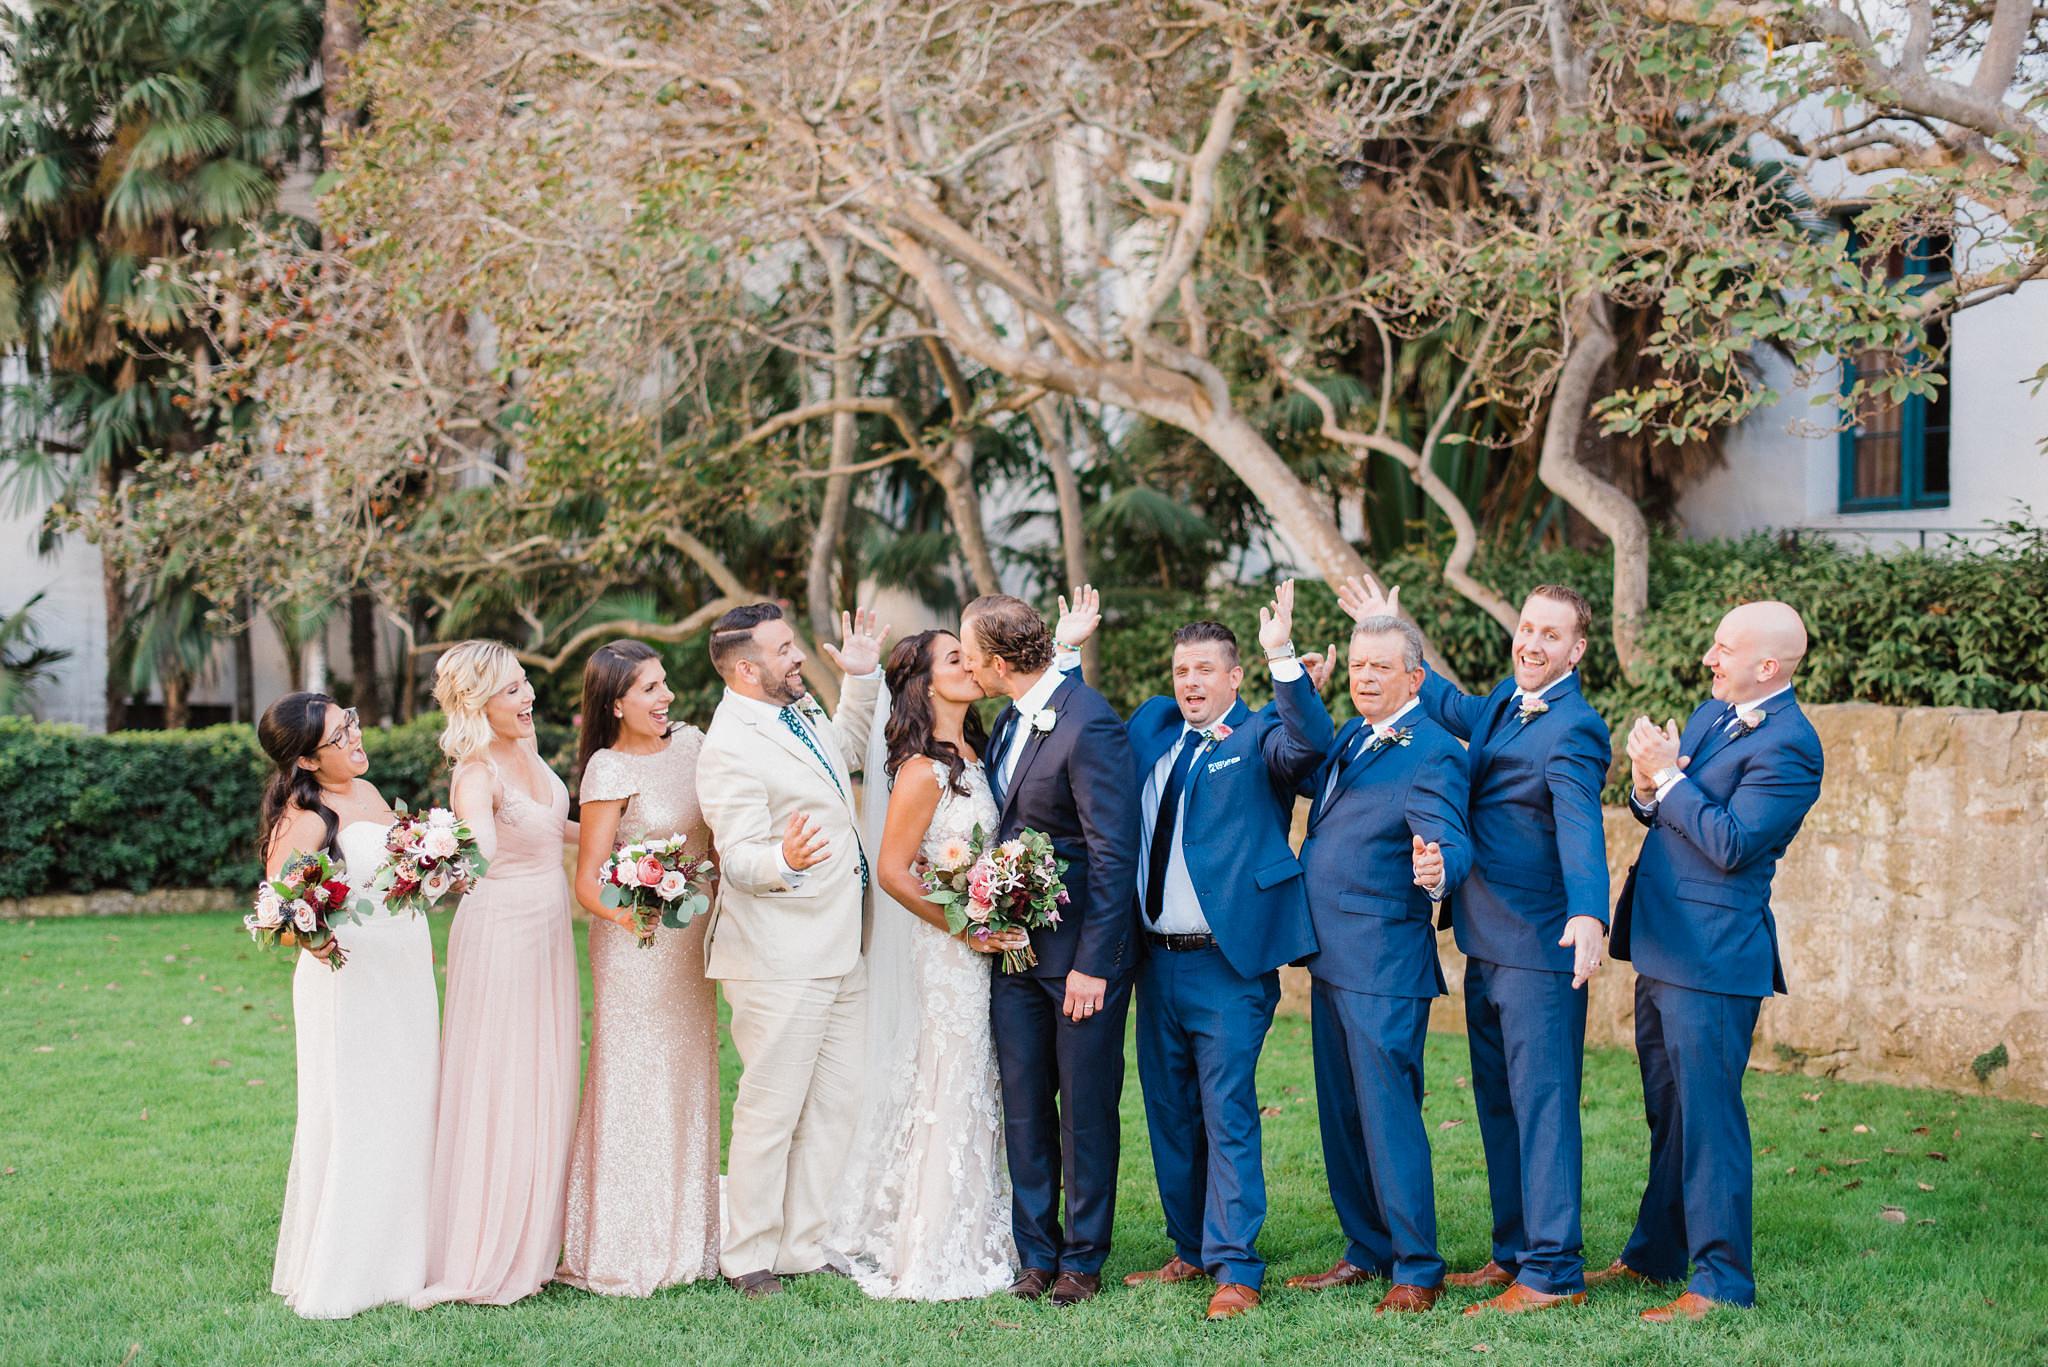 www.santabarbarawedding.com | Grace Kathryn Photography | Santa Barbara Courthouse | Canary Hotel | Amazing Days Events | Bridal Party